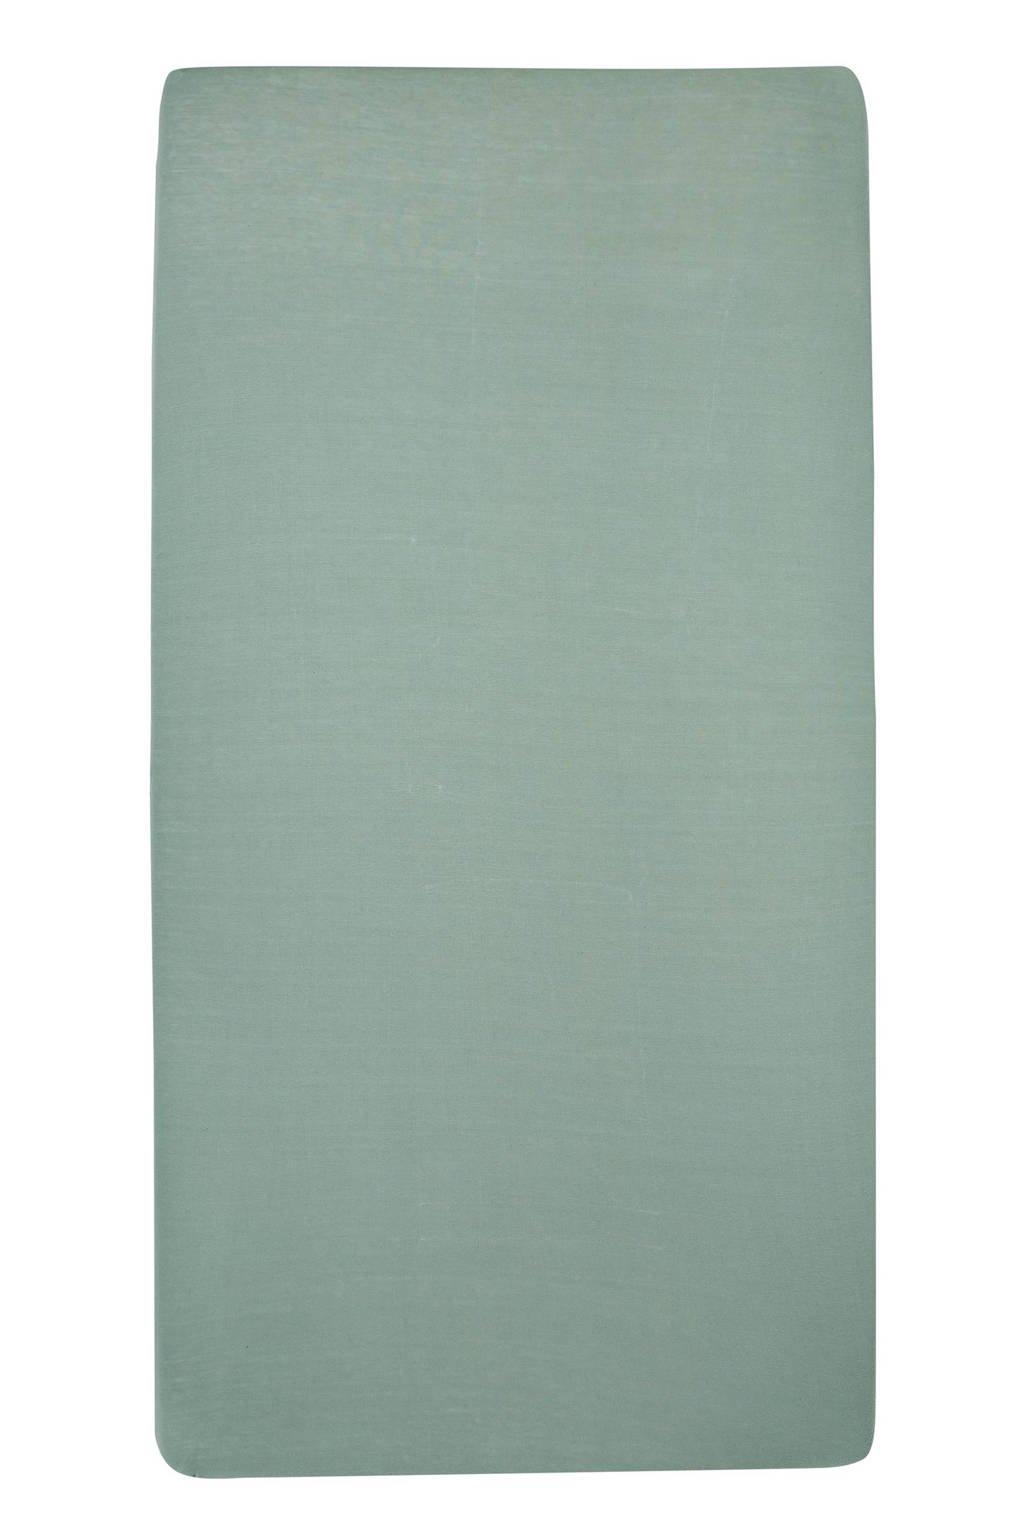 Meyco jersey baby hoeslaken ledikant 60x120 cm, Stone Green